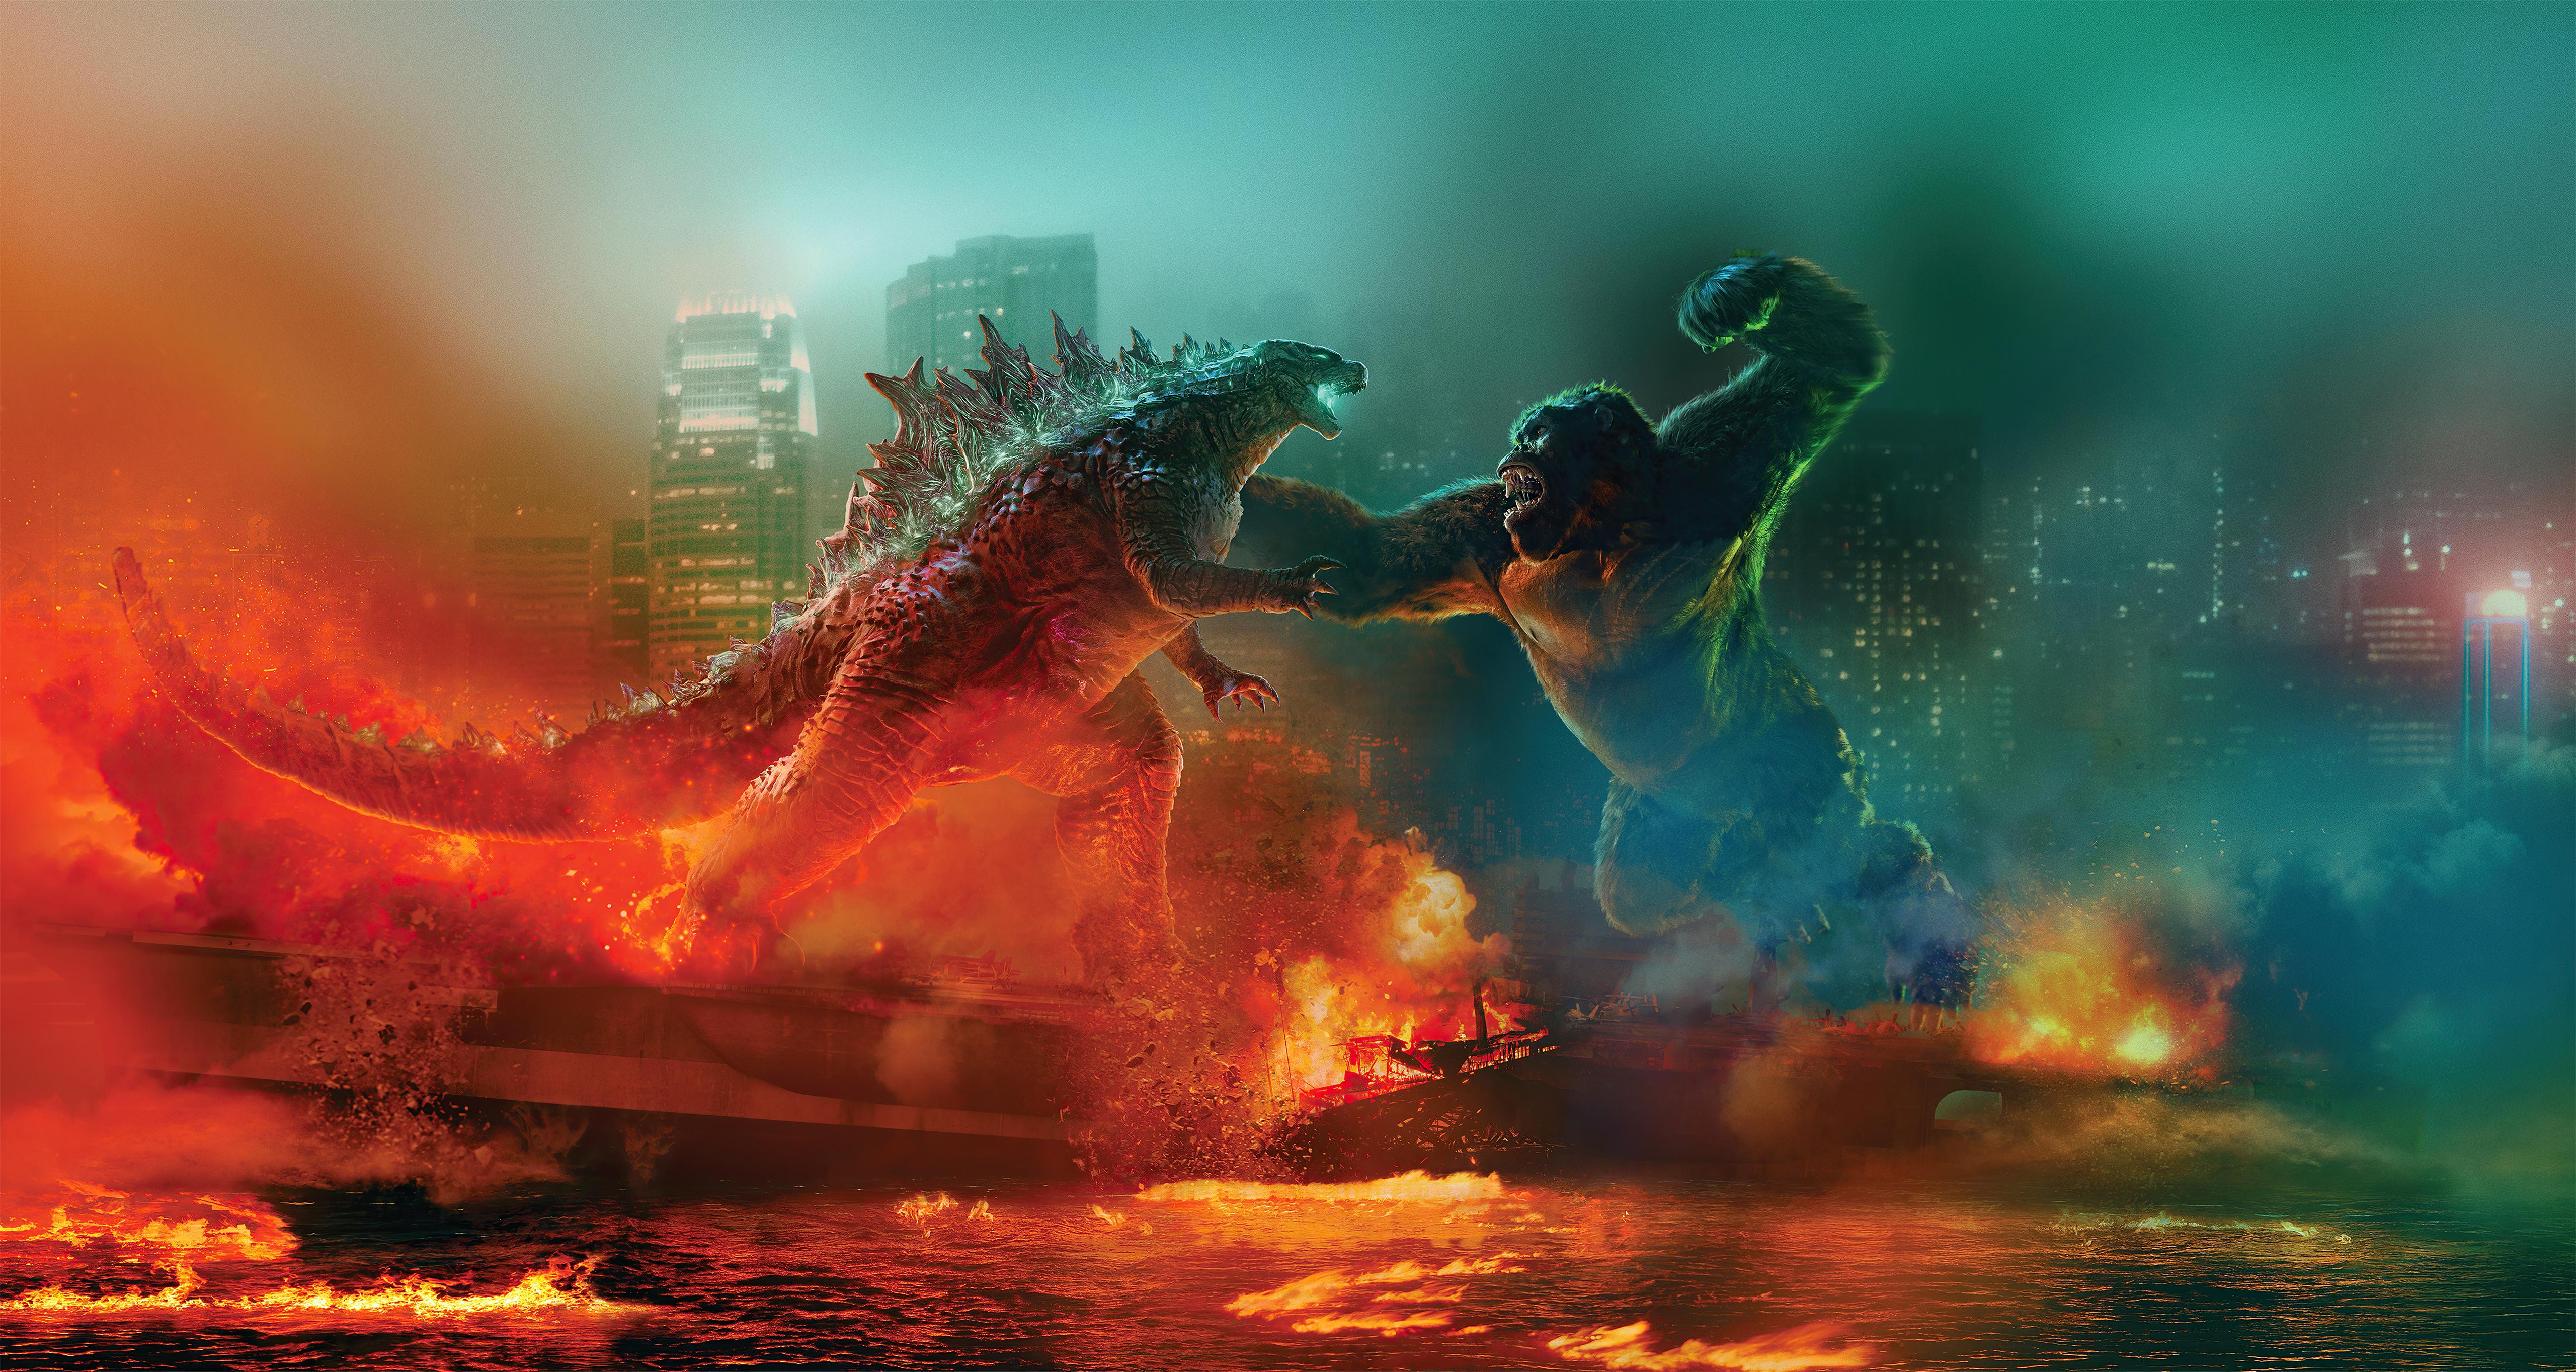 godzilla vs kong fight 4k 1618165968 - Godzilla Vs Kong Fight 4k - Godzilla Vs Kong Fight 4k wallpapers